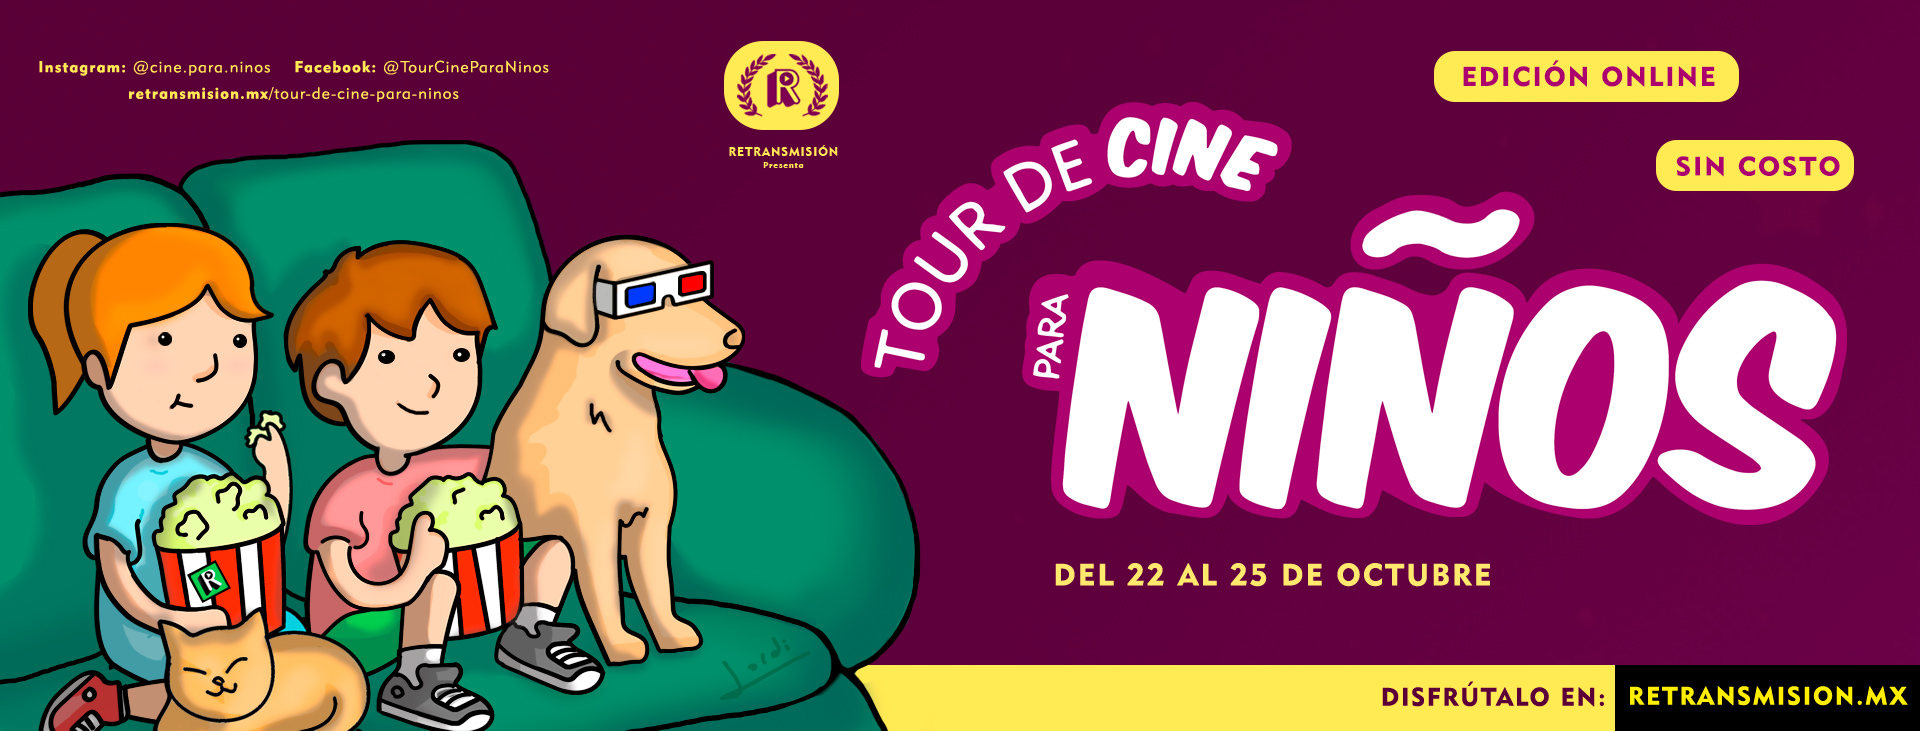 Poster--Jordi-Sitja-Floresr-Tour-de-Cine-Para-Ninos-Retransmision-2020-Mexico